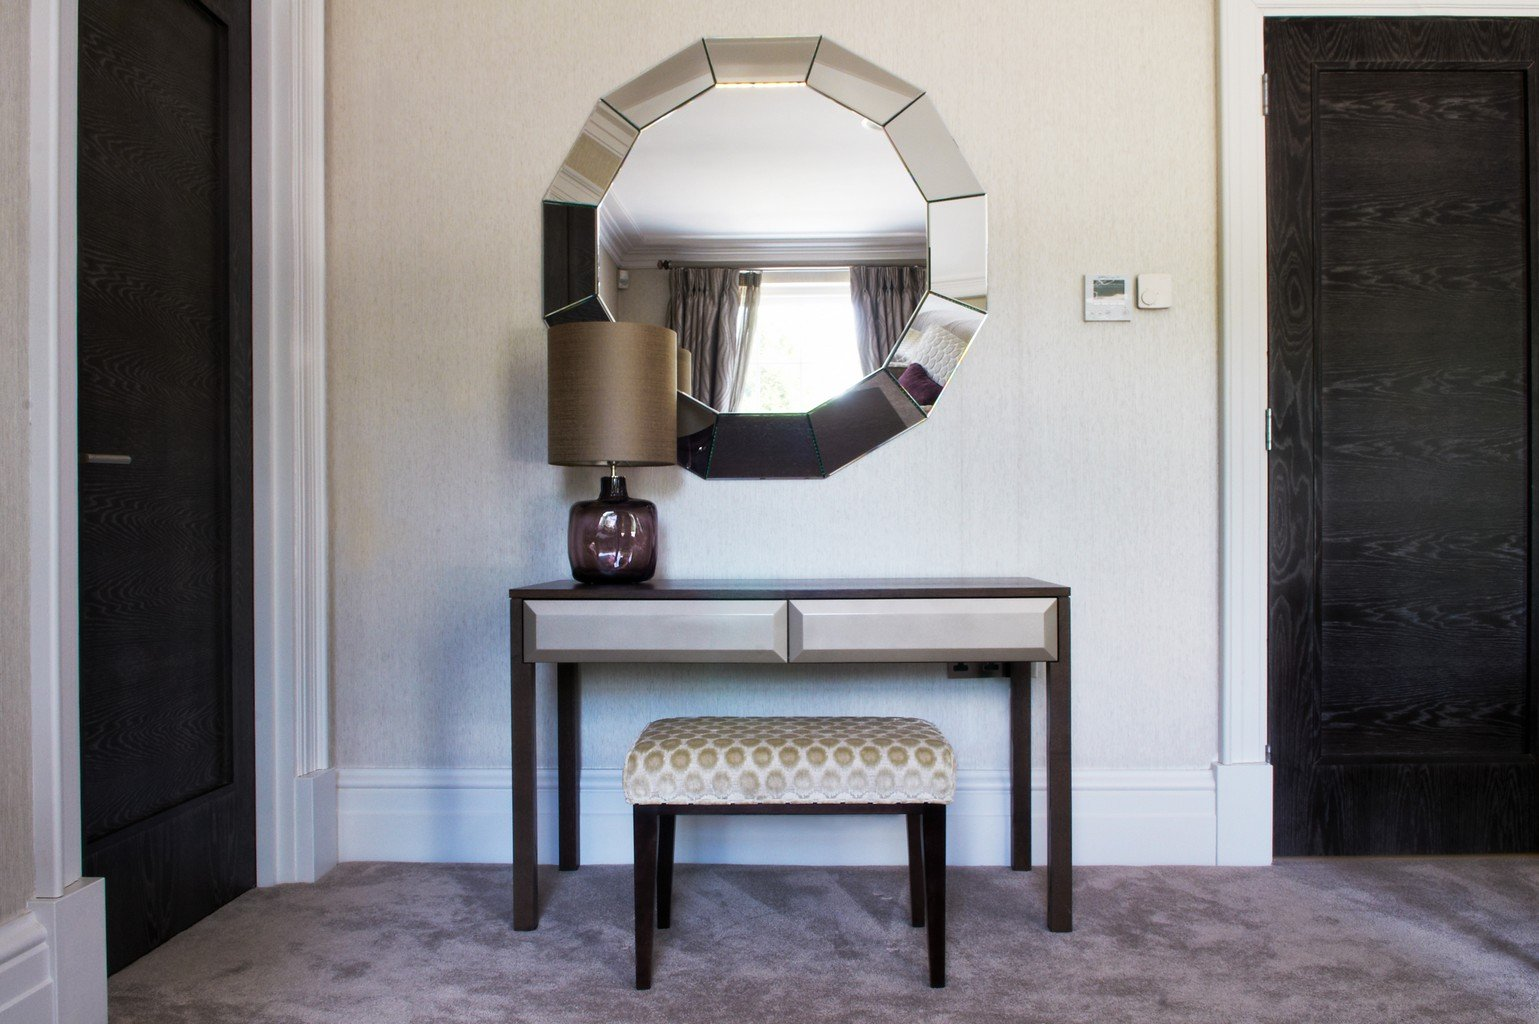 Sylka carpet with mirror